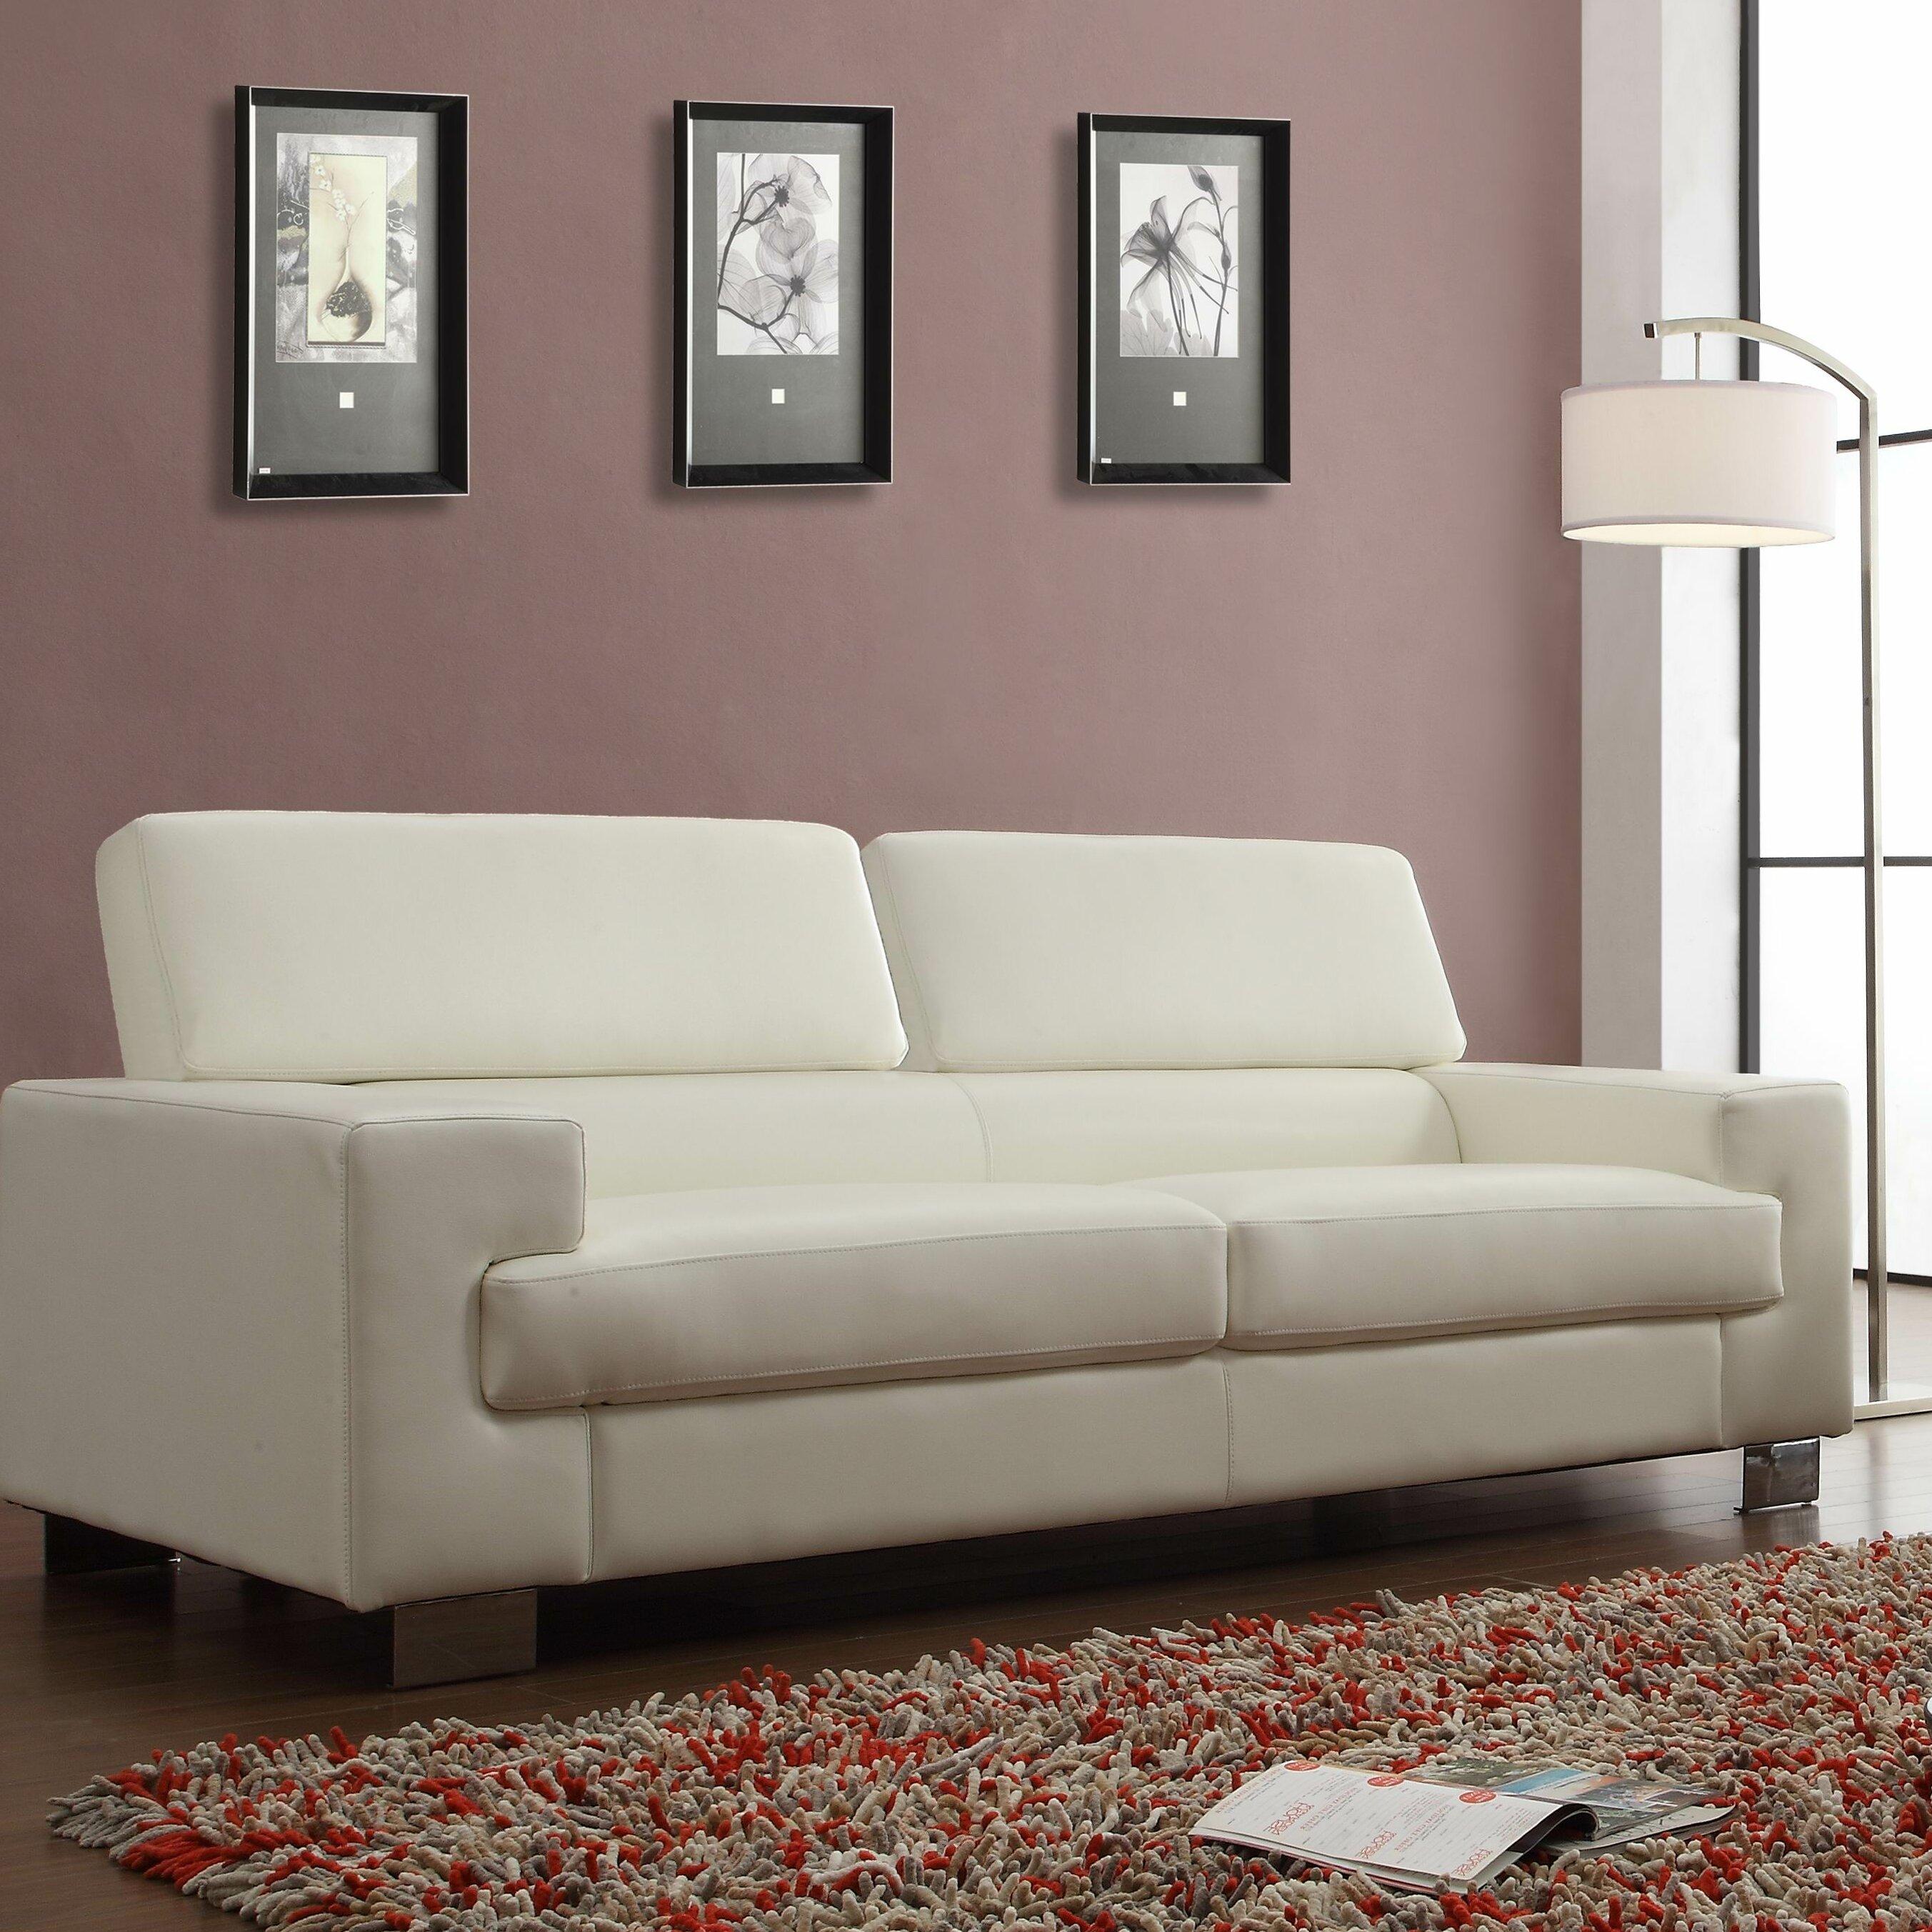 woodhaven hill vernon sofa reviews wayfair. Black Bedroom Furniture Sets. Home Design Ideas